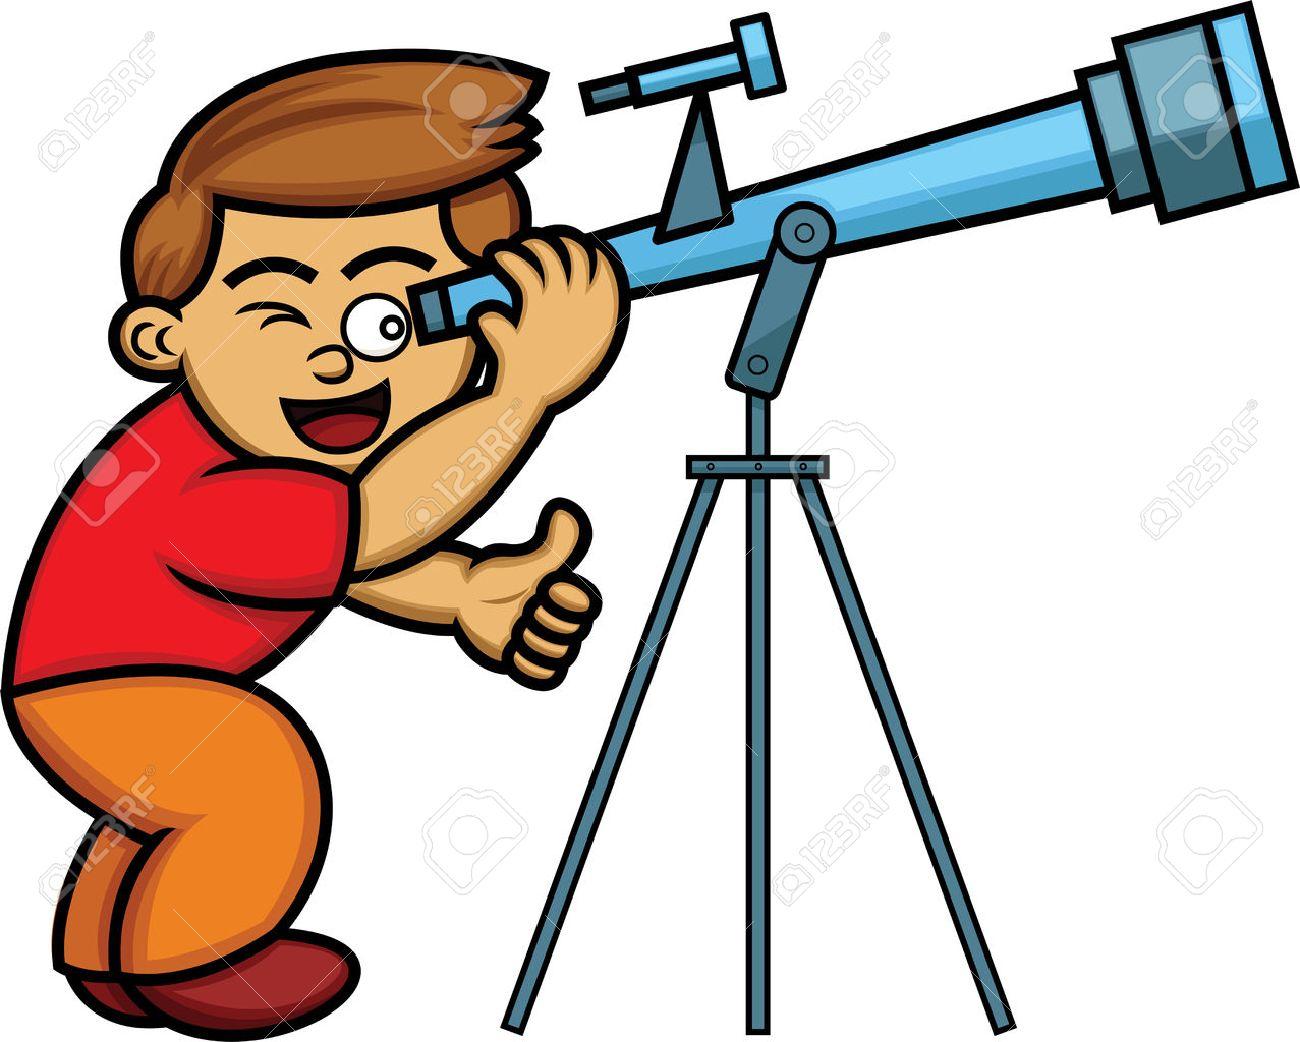 Cartoon illustration of a boy looking through telescope.